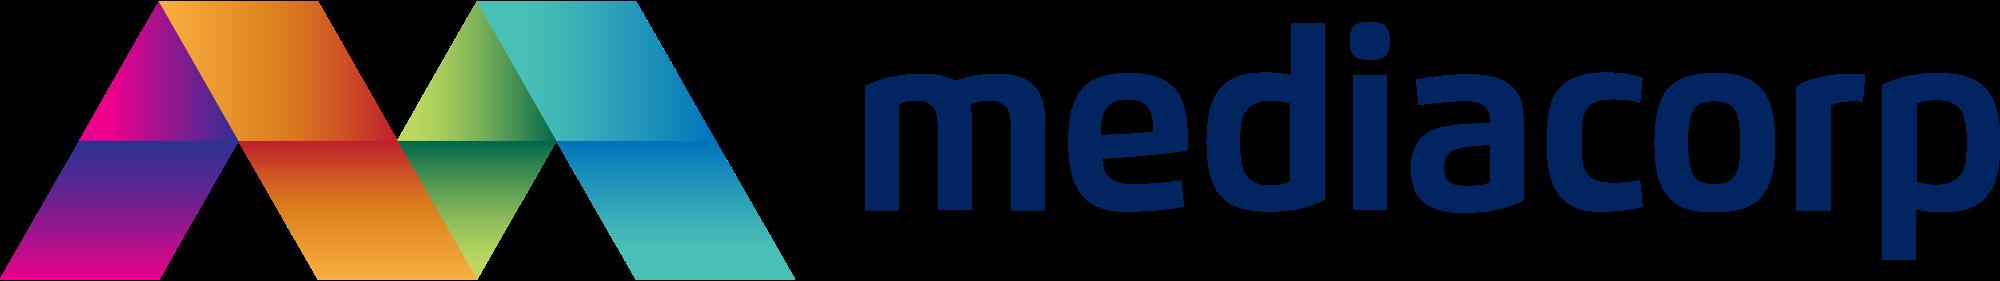 MediaCorp_logo